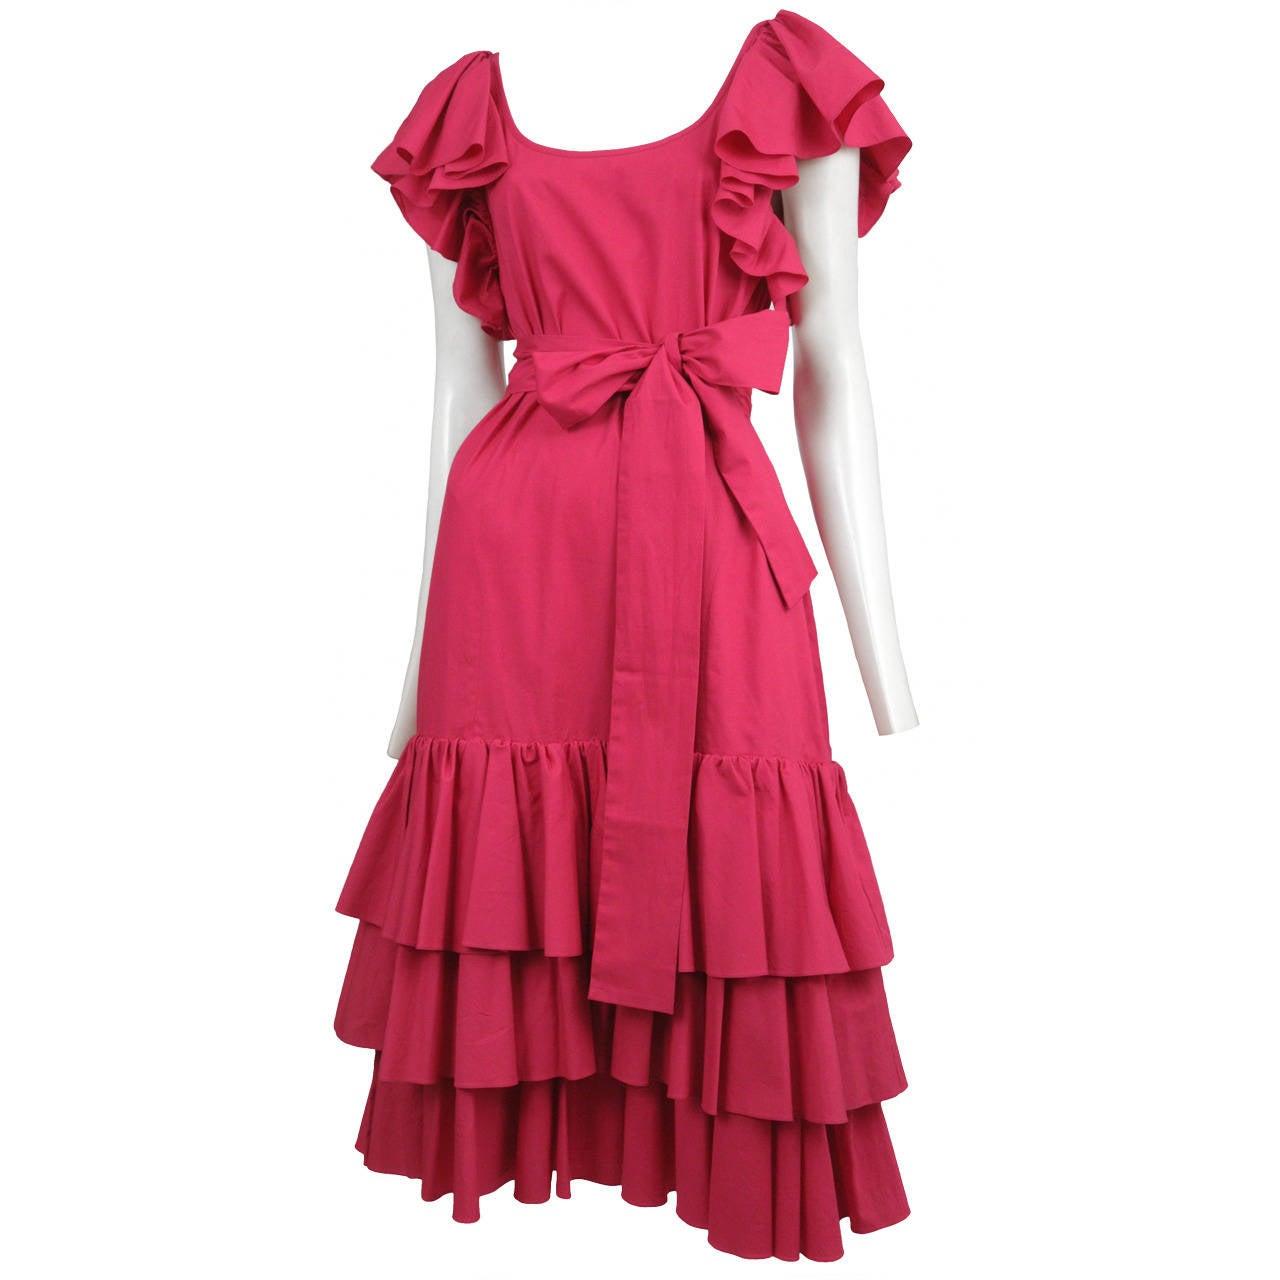 Yves Saint Laurent Pink Cotton Ruffle Dress 1